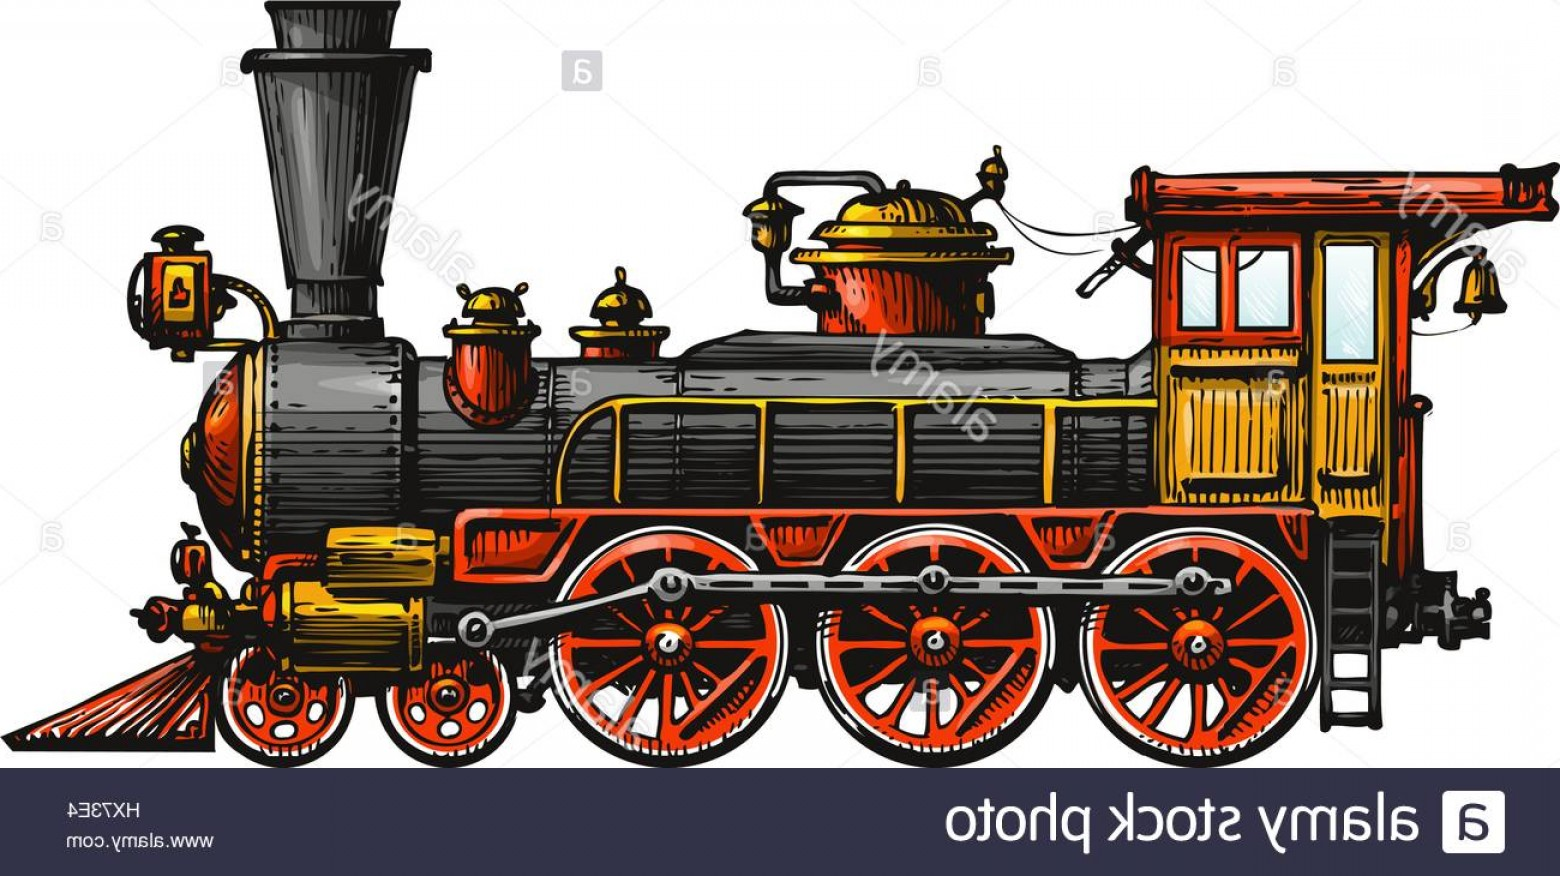 1560x876 Stock Photo Vintage Steam Locomotive Drawn Ancient Train Transport